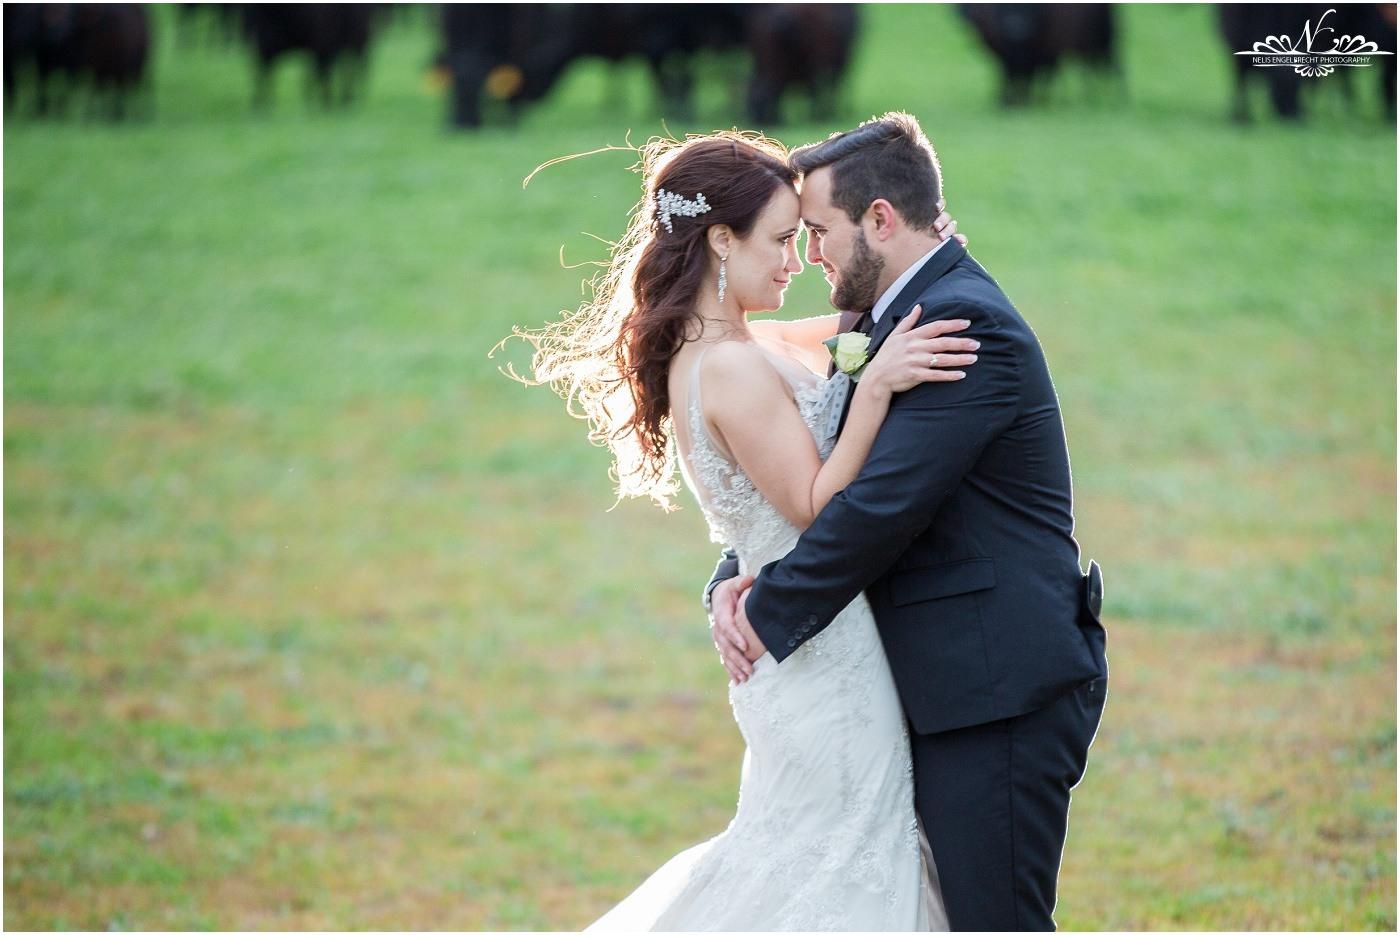 Eensgezind-Wedding-Photos-Nelis-Engelbrecht-Photography-170